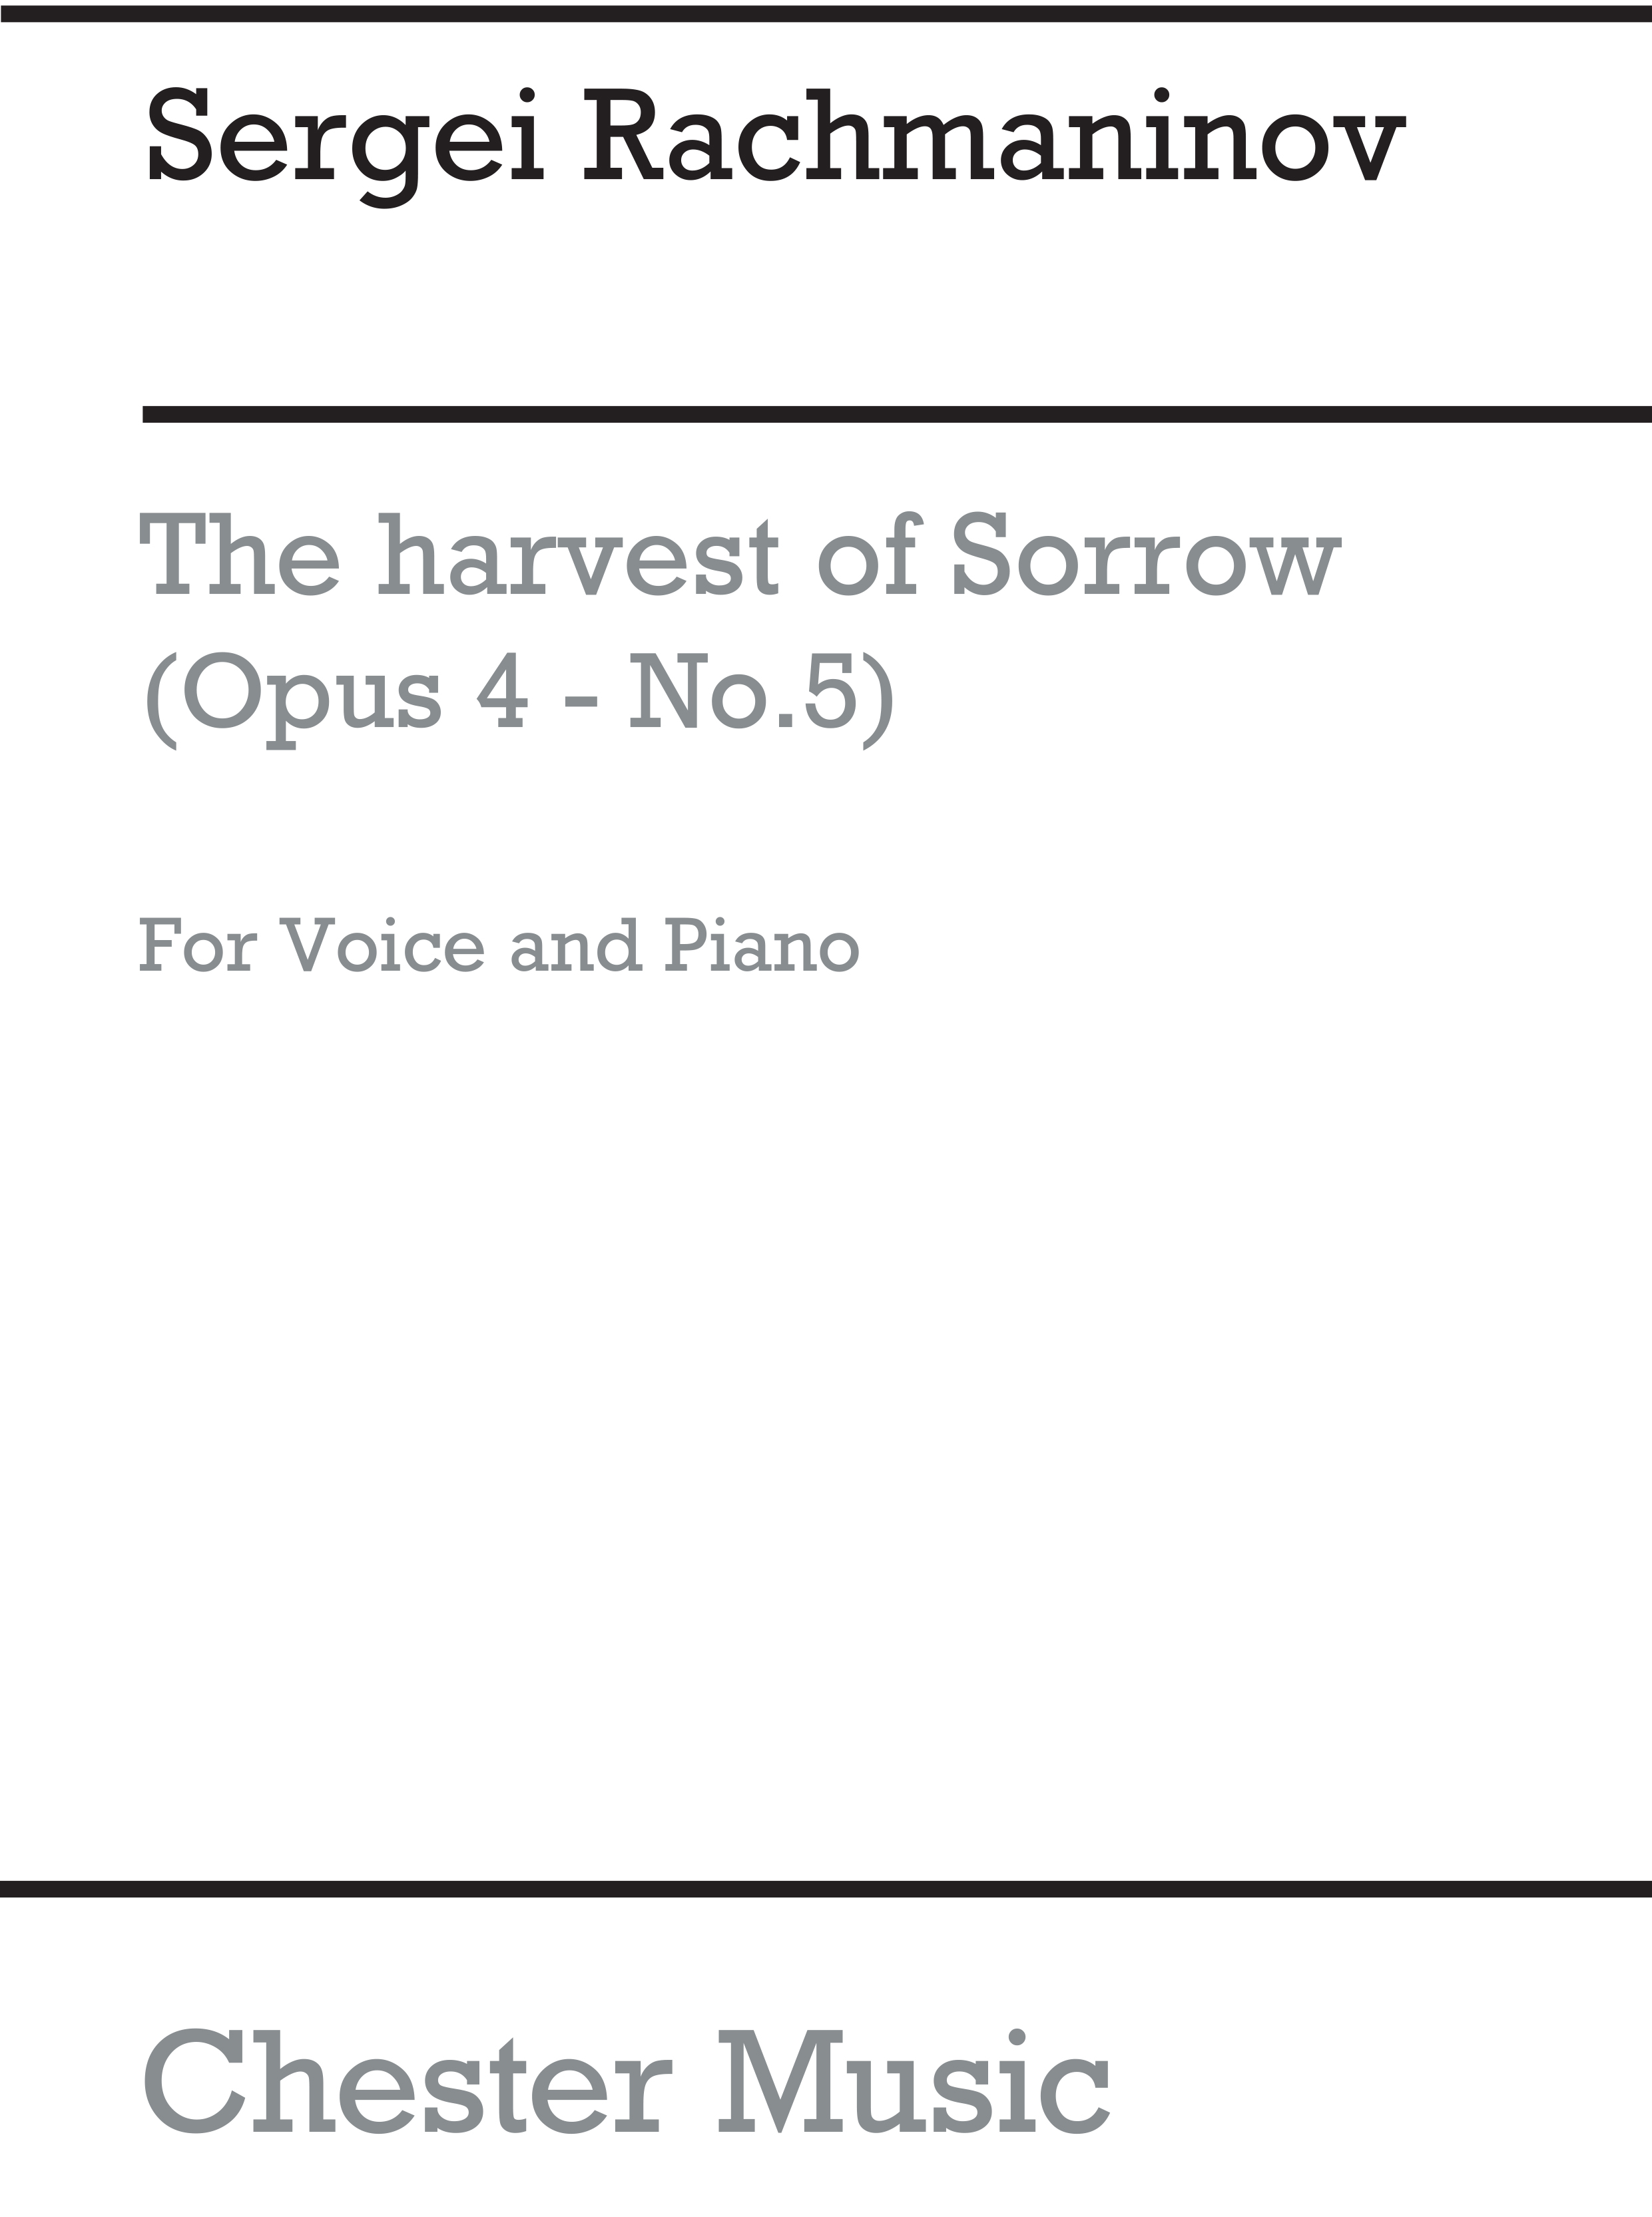 Sergei Rachmaninov: The Harvest Of Sorrow Op.4/5: Voice: Vocal Work